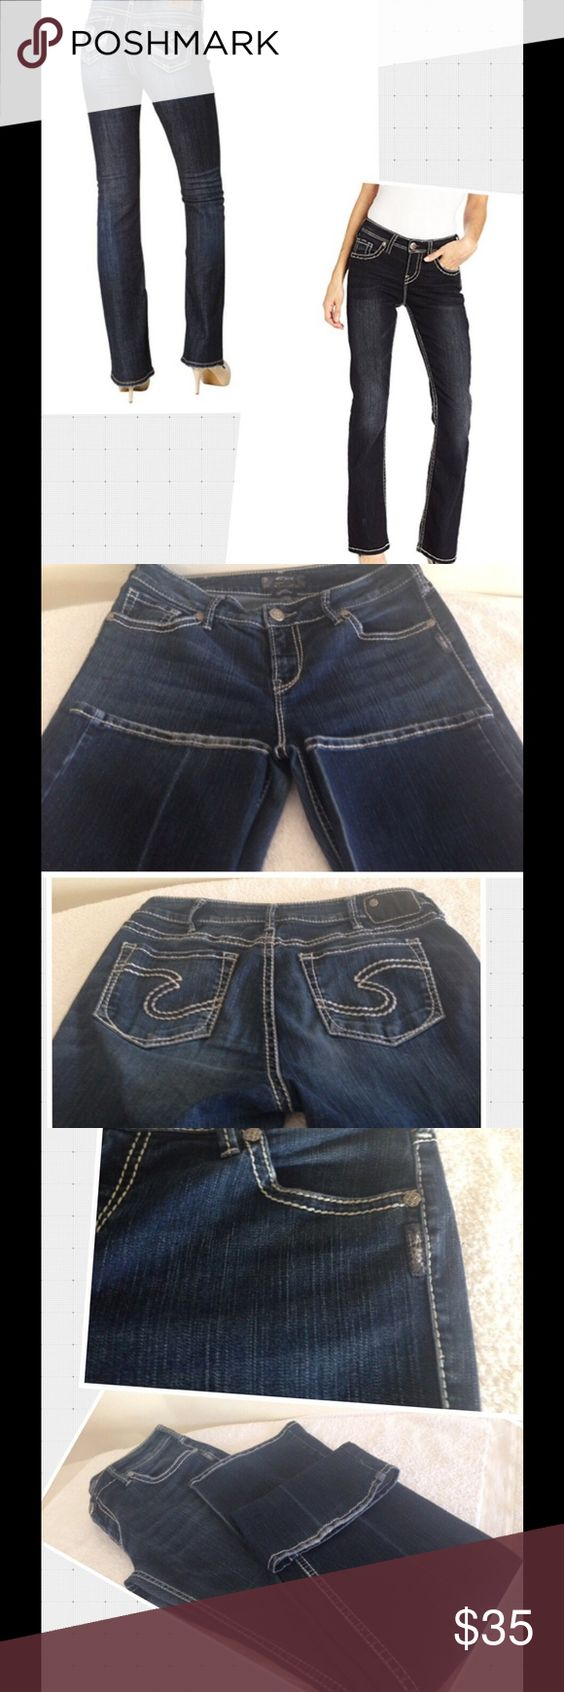 Natsuki Silver Jeans Co., boot cut Jeans Size 32